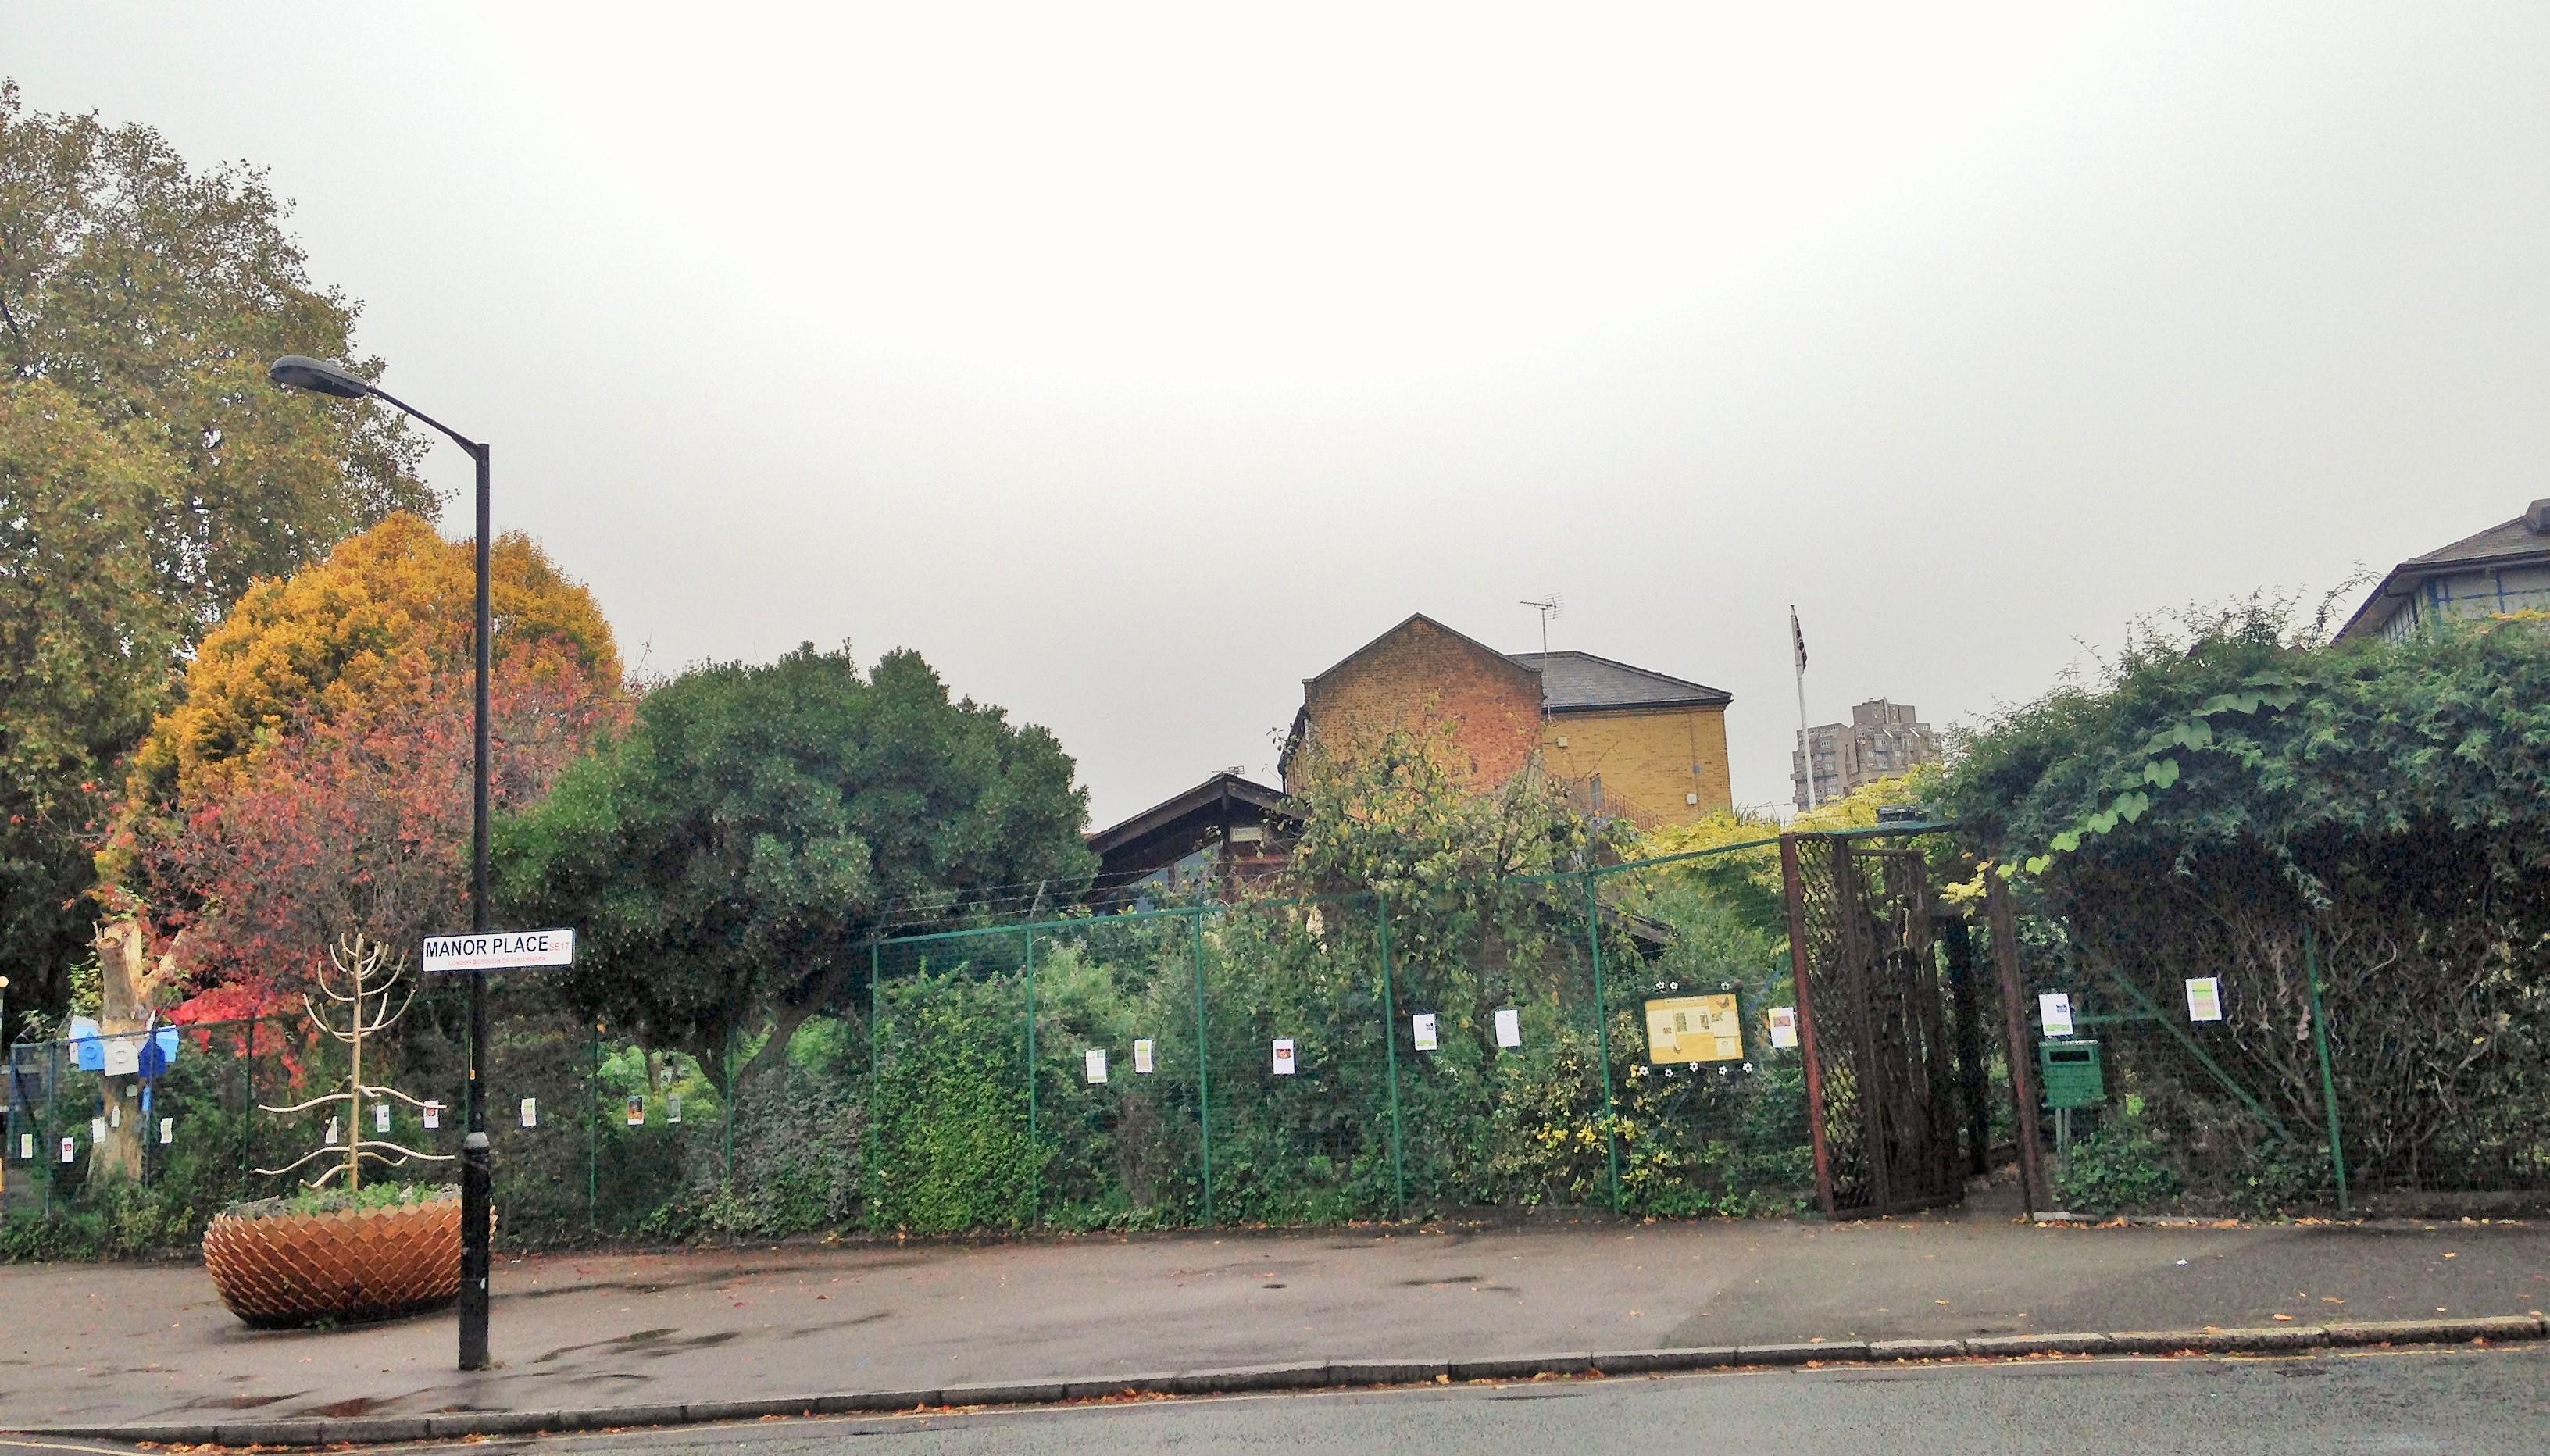 Walworth Garden Farm exterior - kenningtonrunoff.com